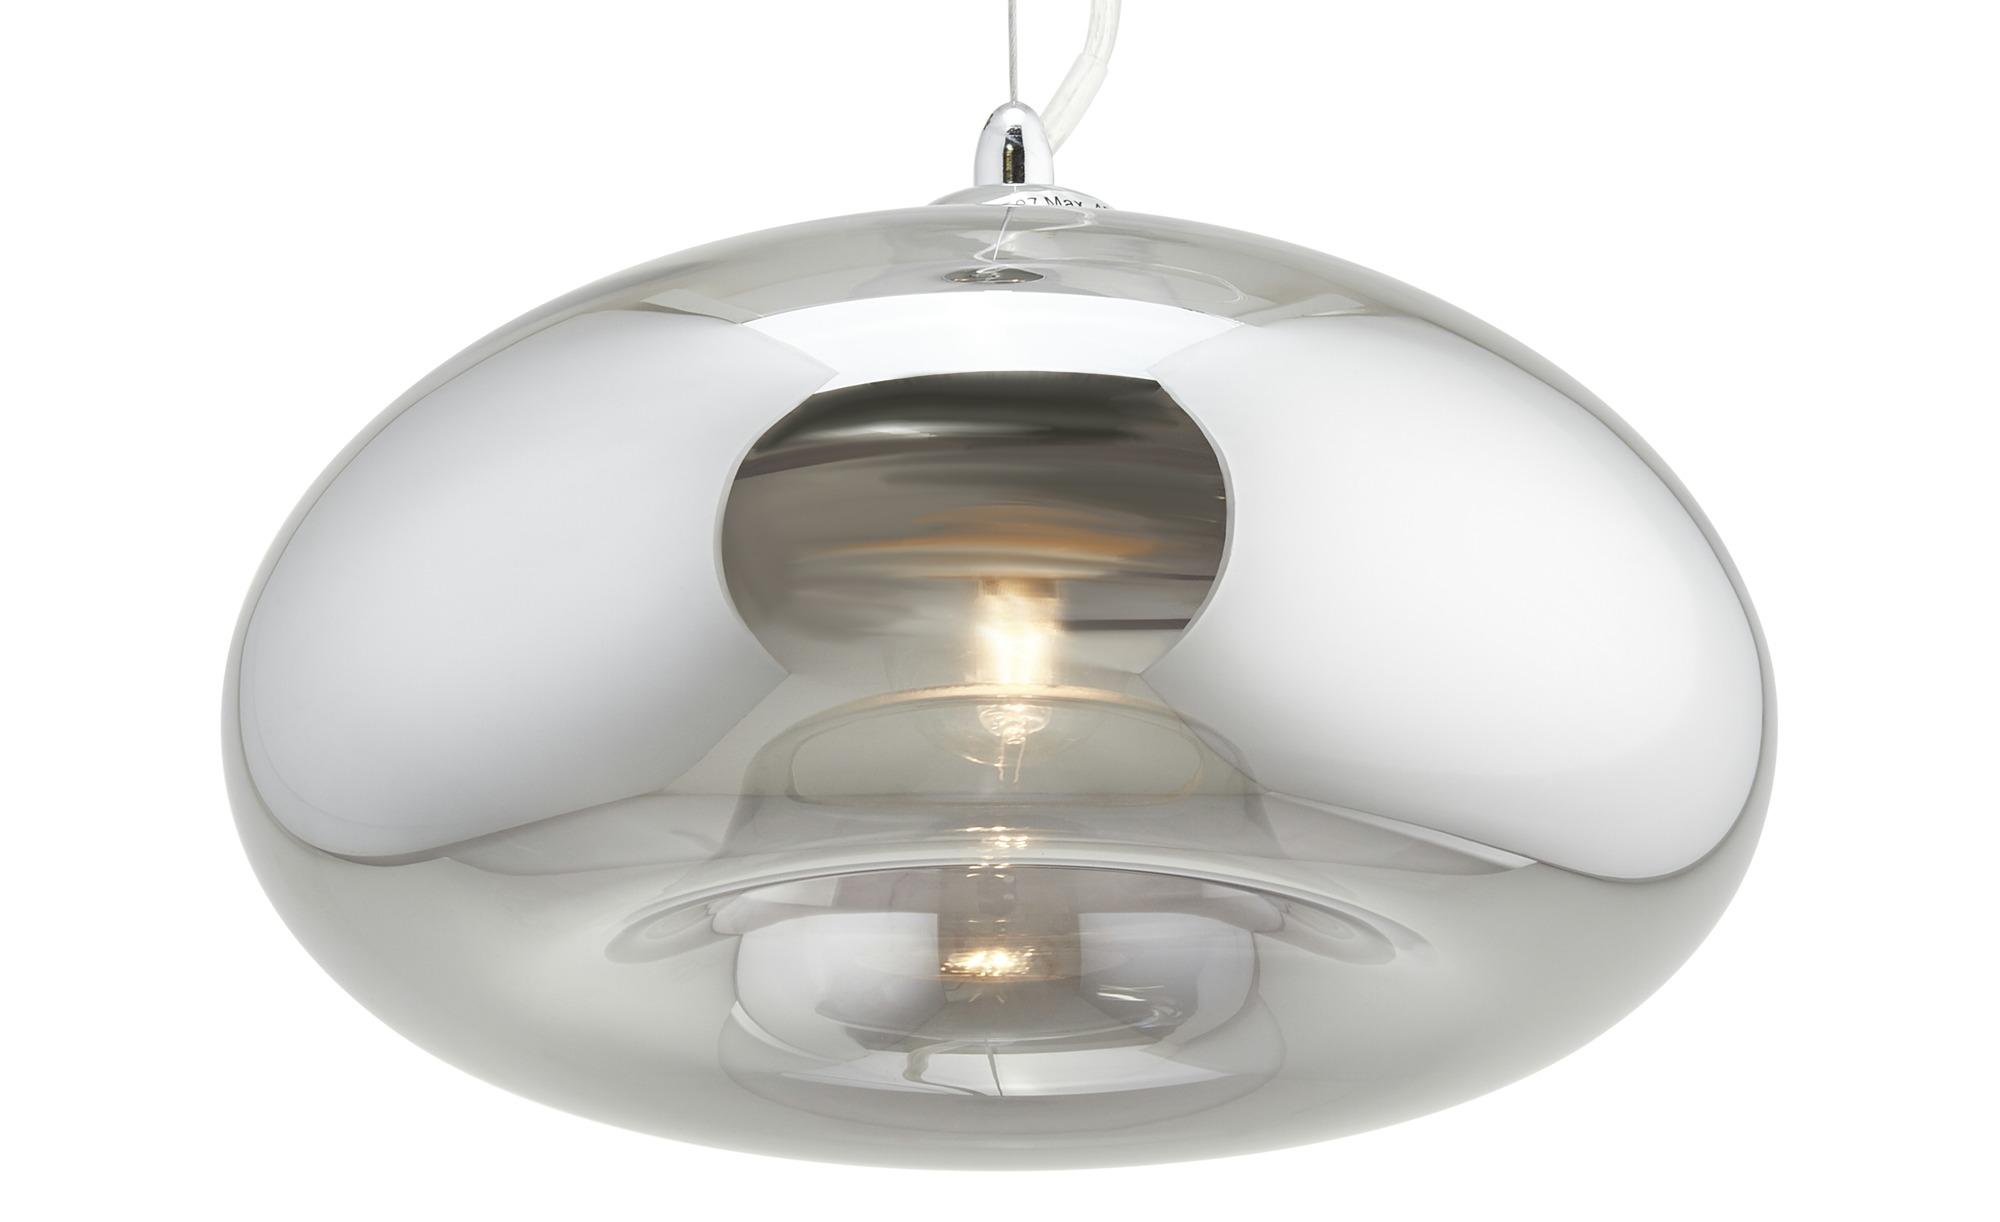 KHG Pendelleuchte, 1-flammig ¦ silber ¦ Maße (cm): H: 150 Ø: 27 Lampen & Leuchten > Innenleuchten > Pendelleuchten - Höffner